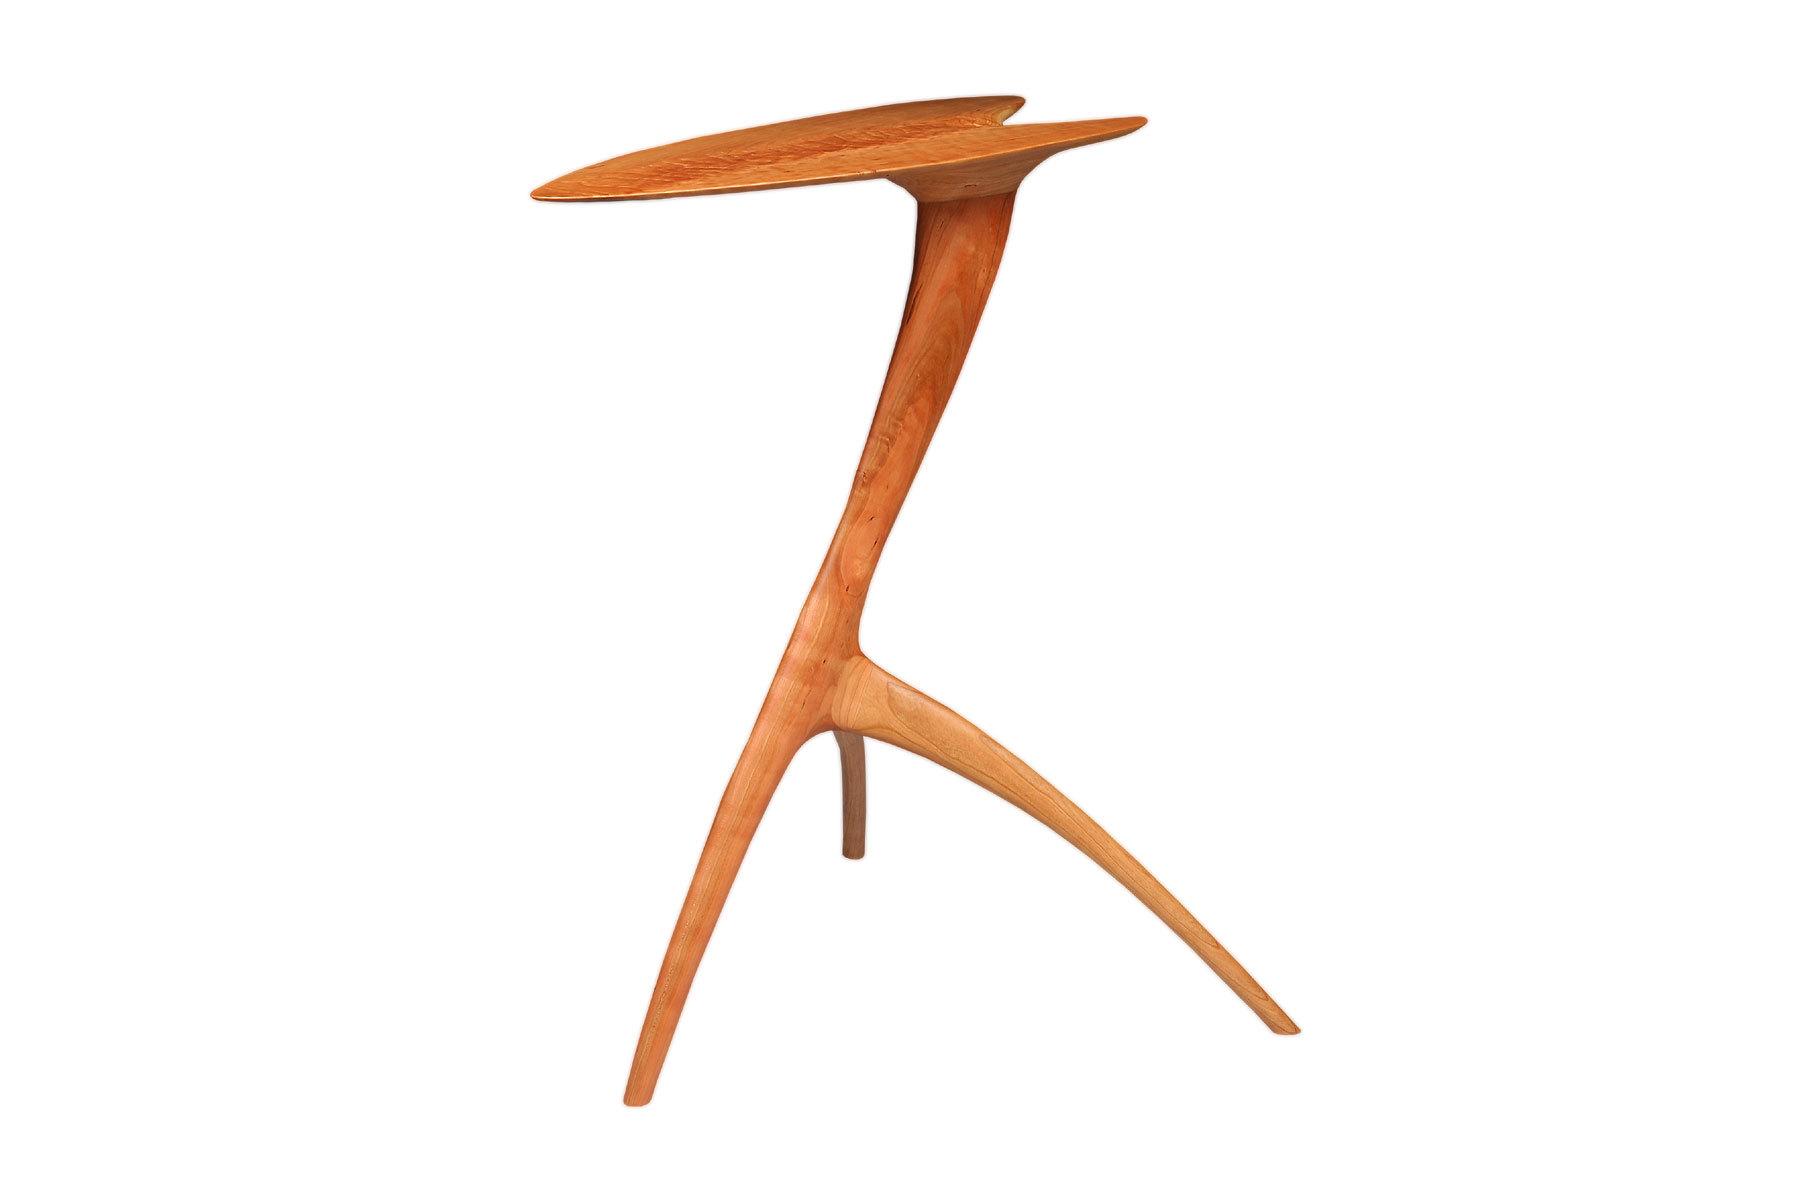 Heron table